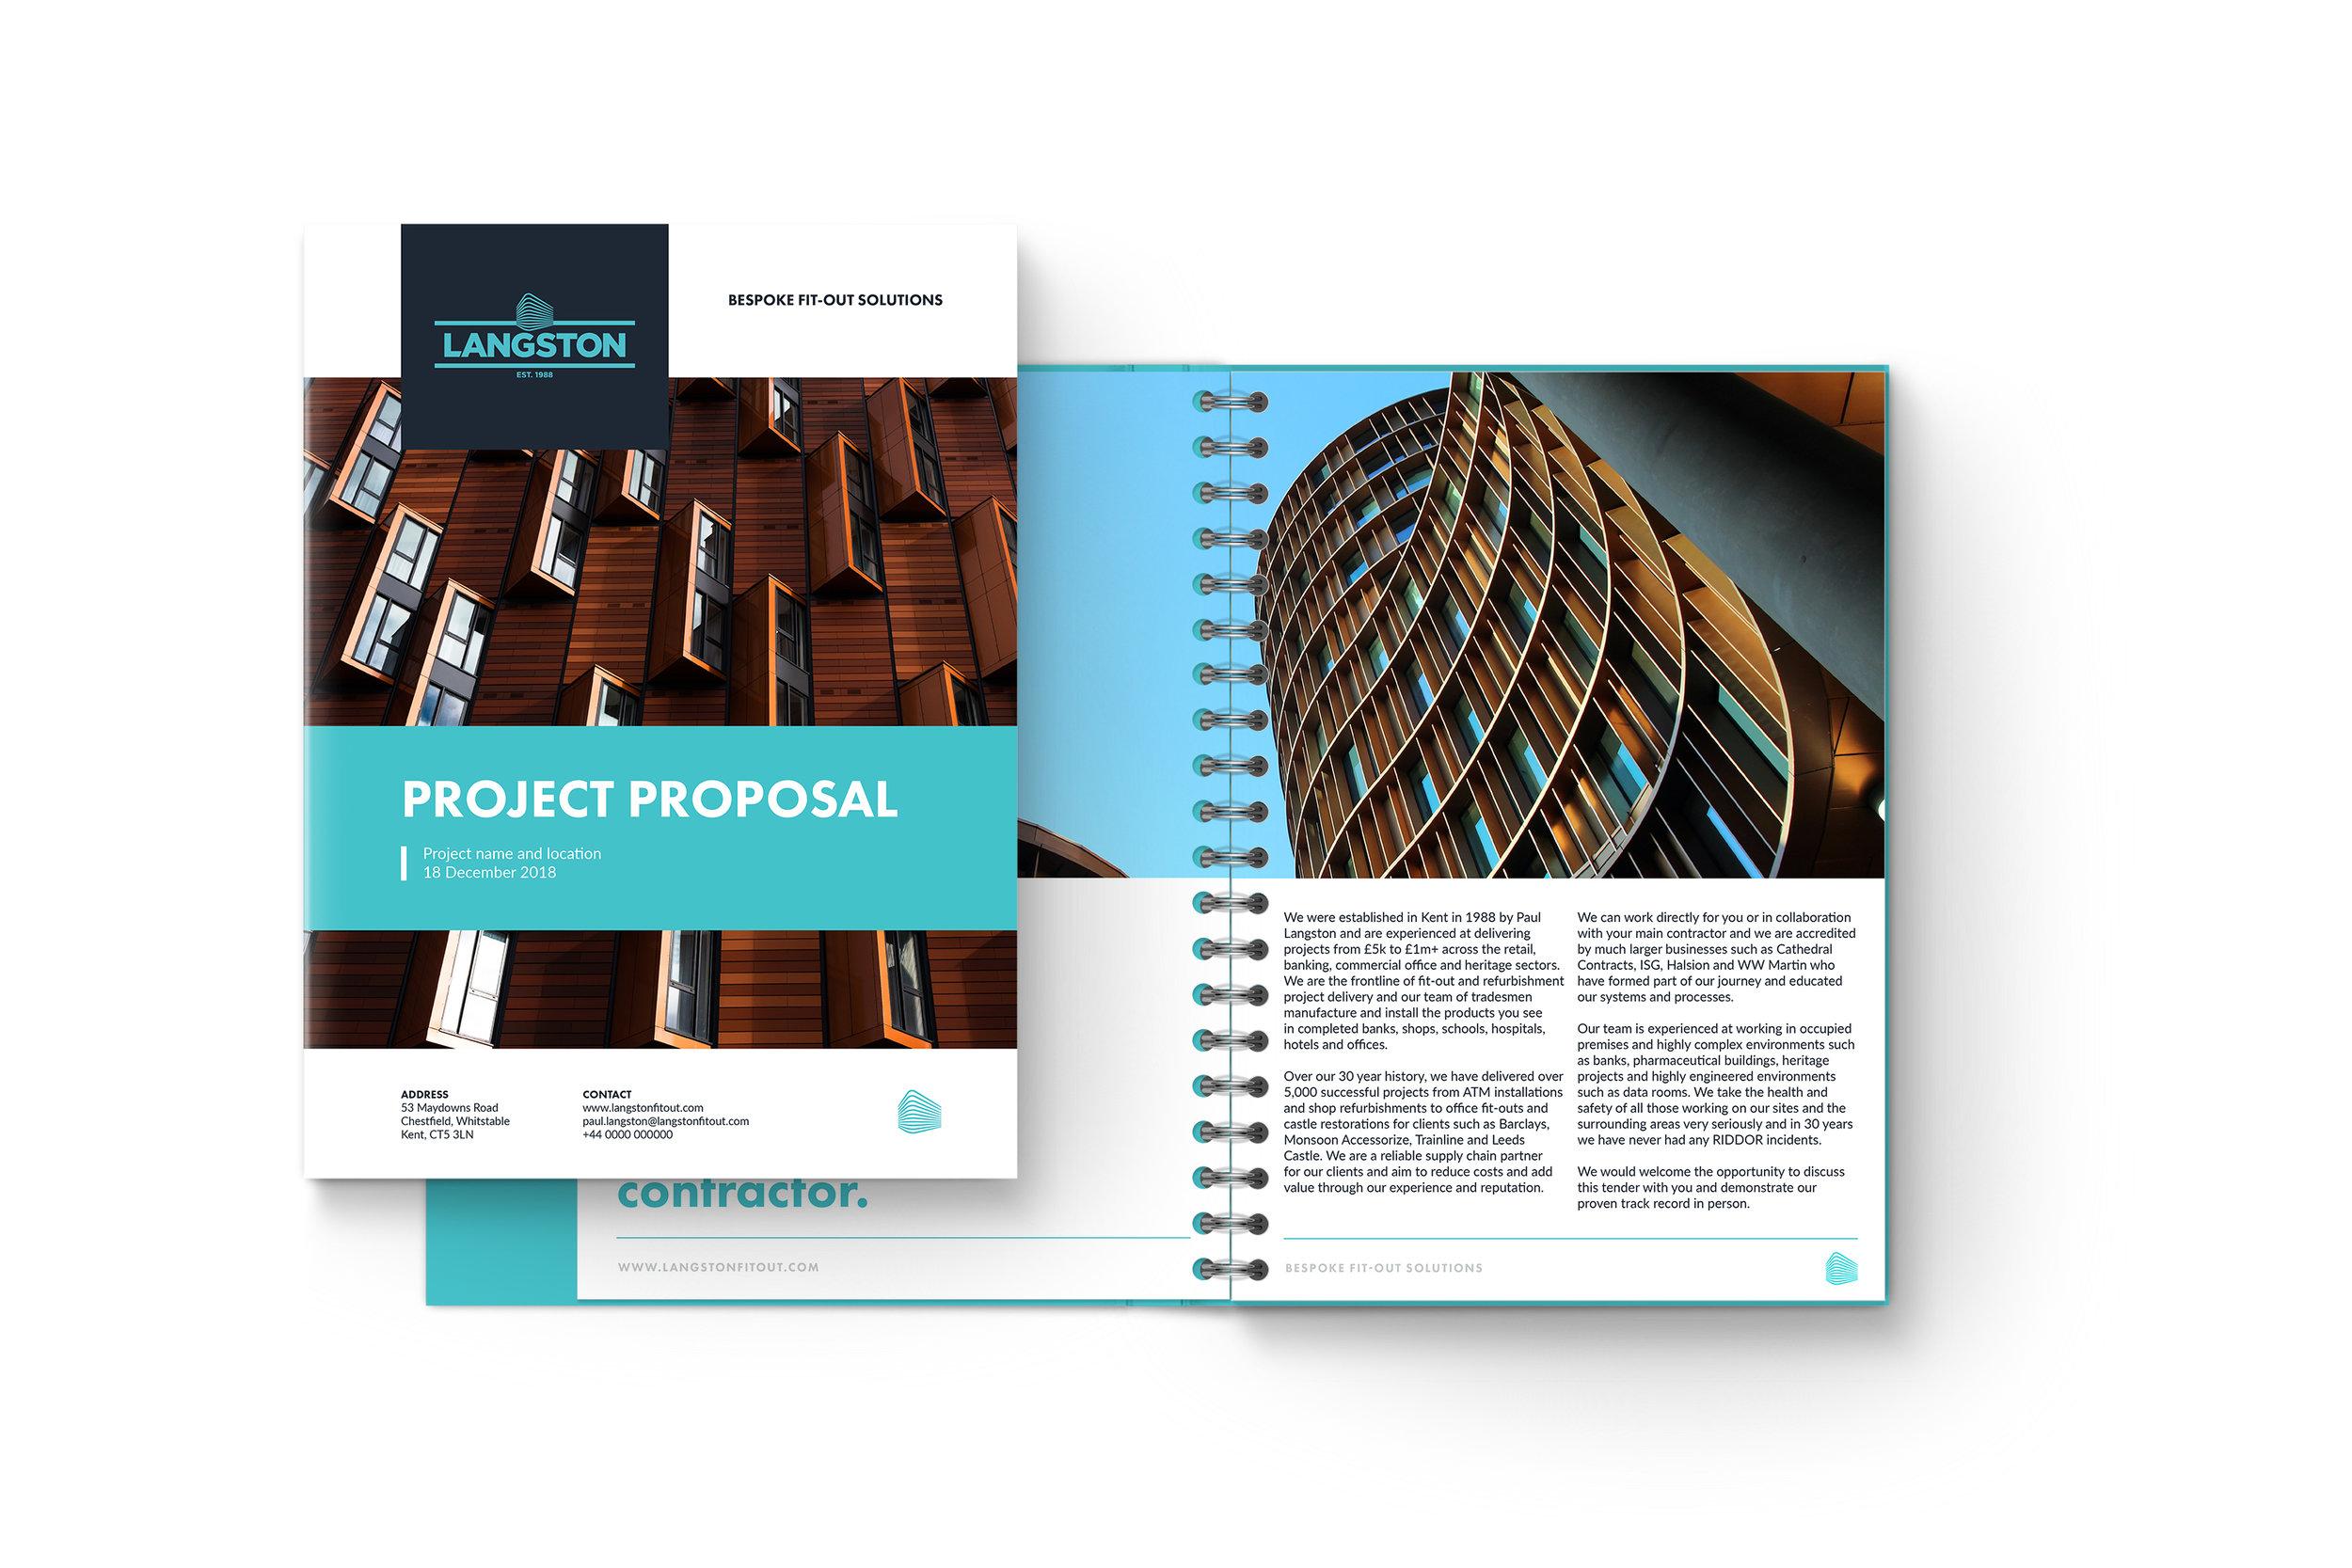 langston-project-proposal-2.jpg